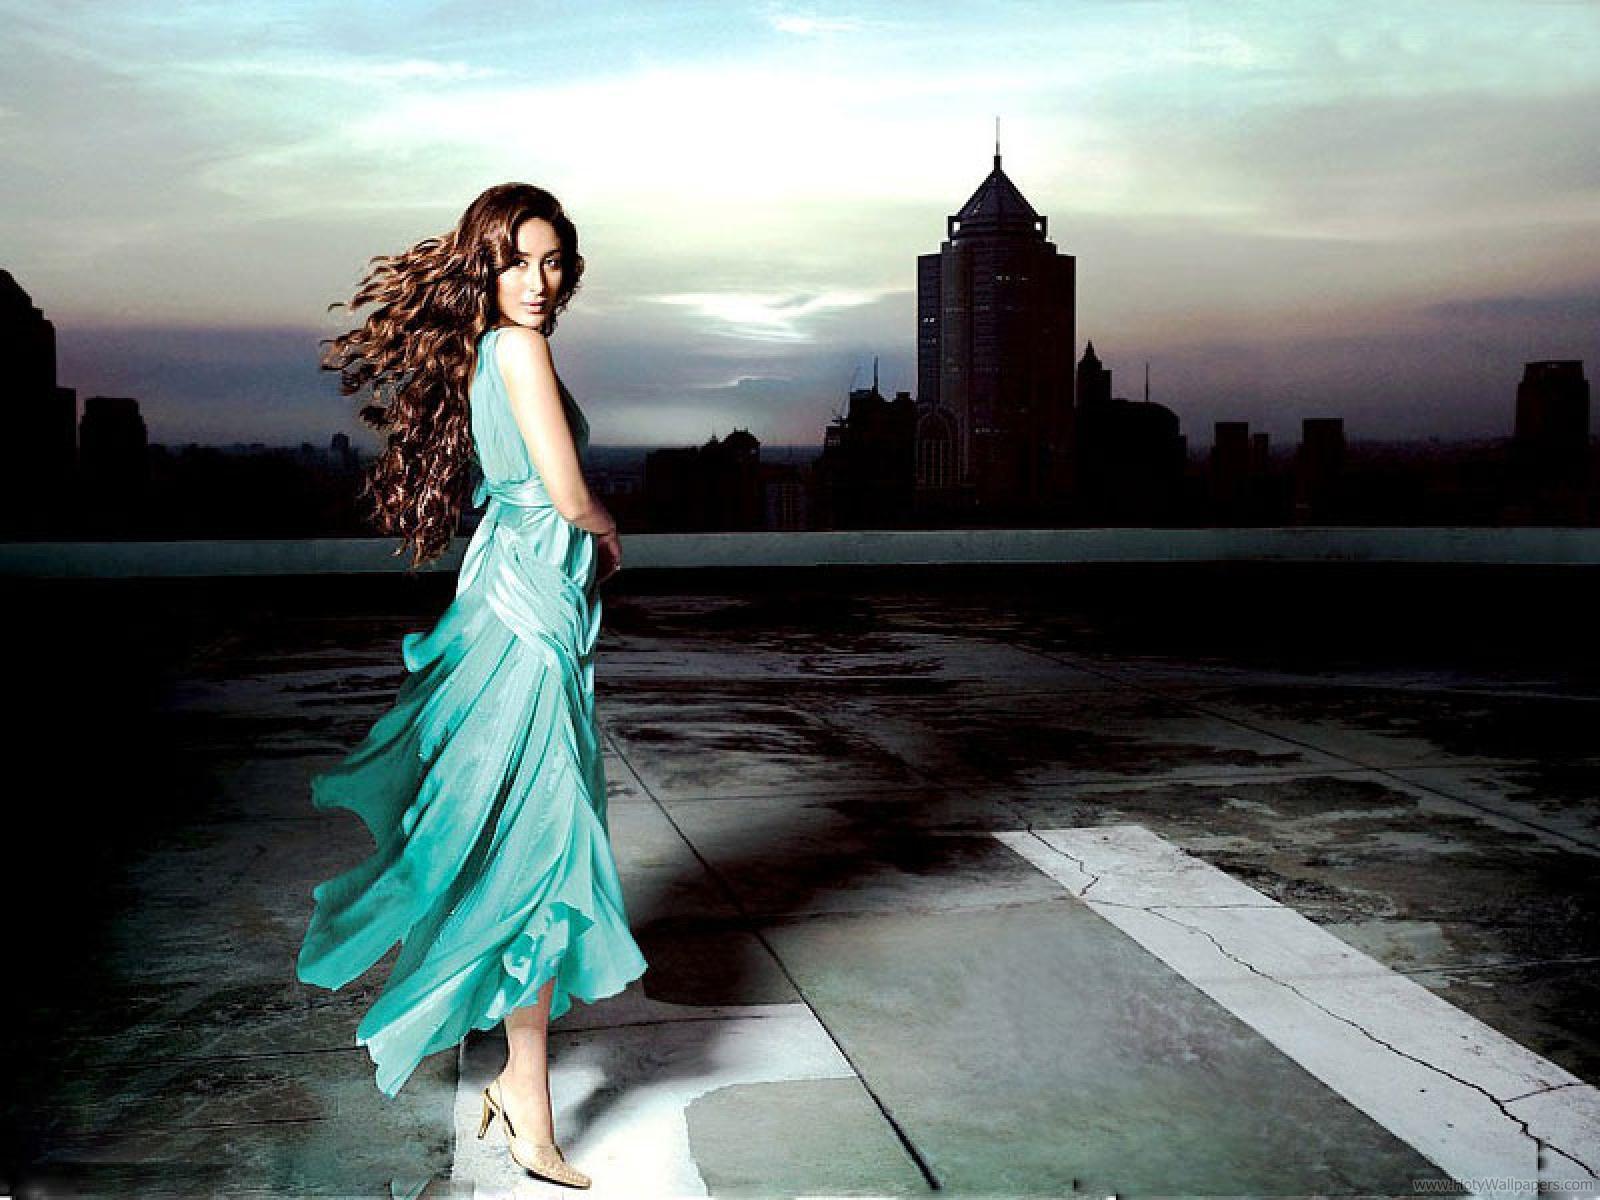 http://1.bp.blogspot.com/-jjsJNDl-V5E/TwsA9ZJO8BI/AAAAAAAADcw/nH5CxVgeqV4/s1600/Pretty_Kareena_Kapoor_Agent_Vinod_Wallpaper.jpg